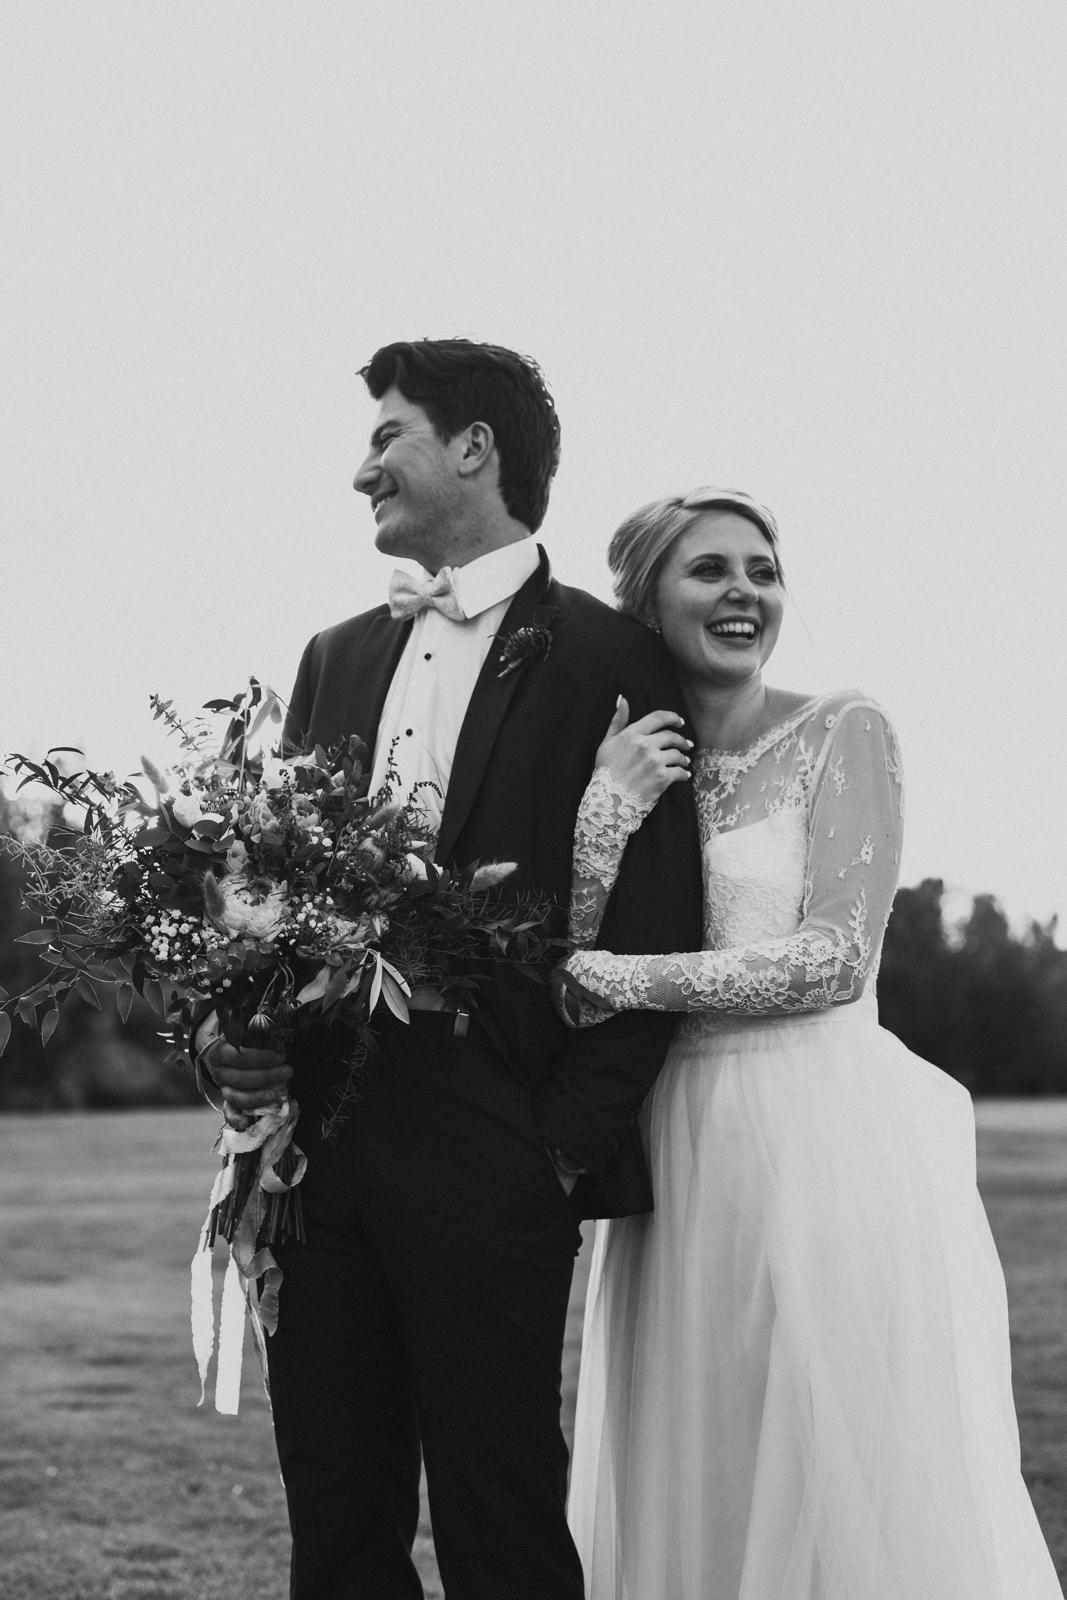 Edmonton_Sunset_Wedding_Photos-49.jpg